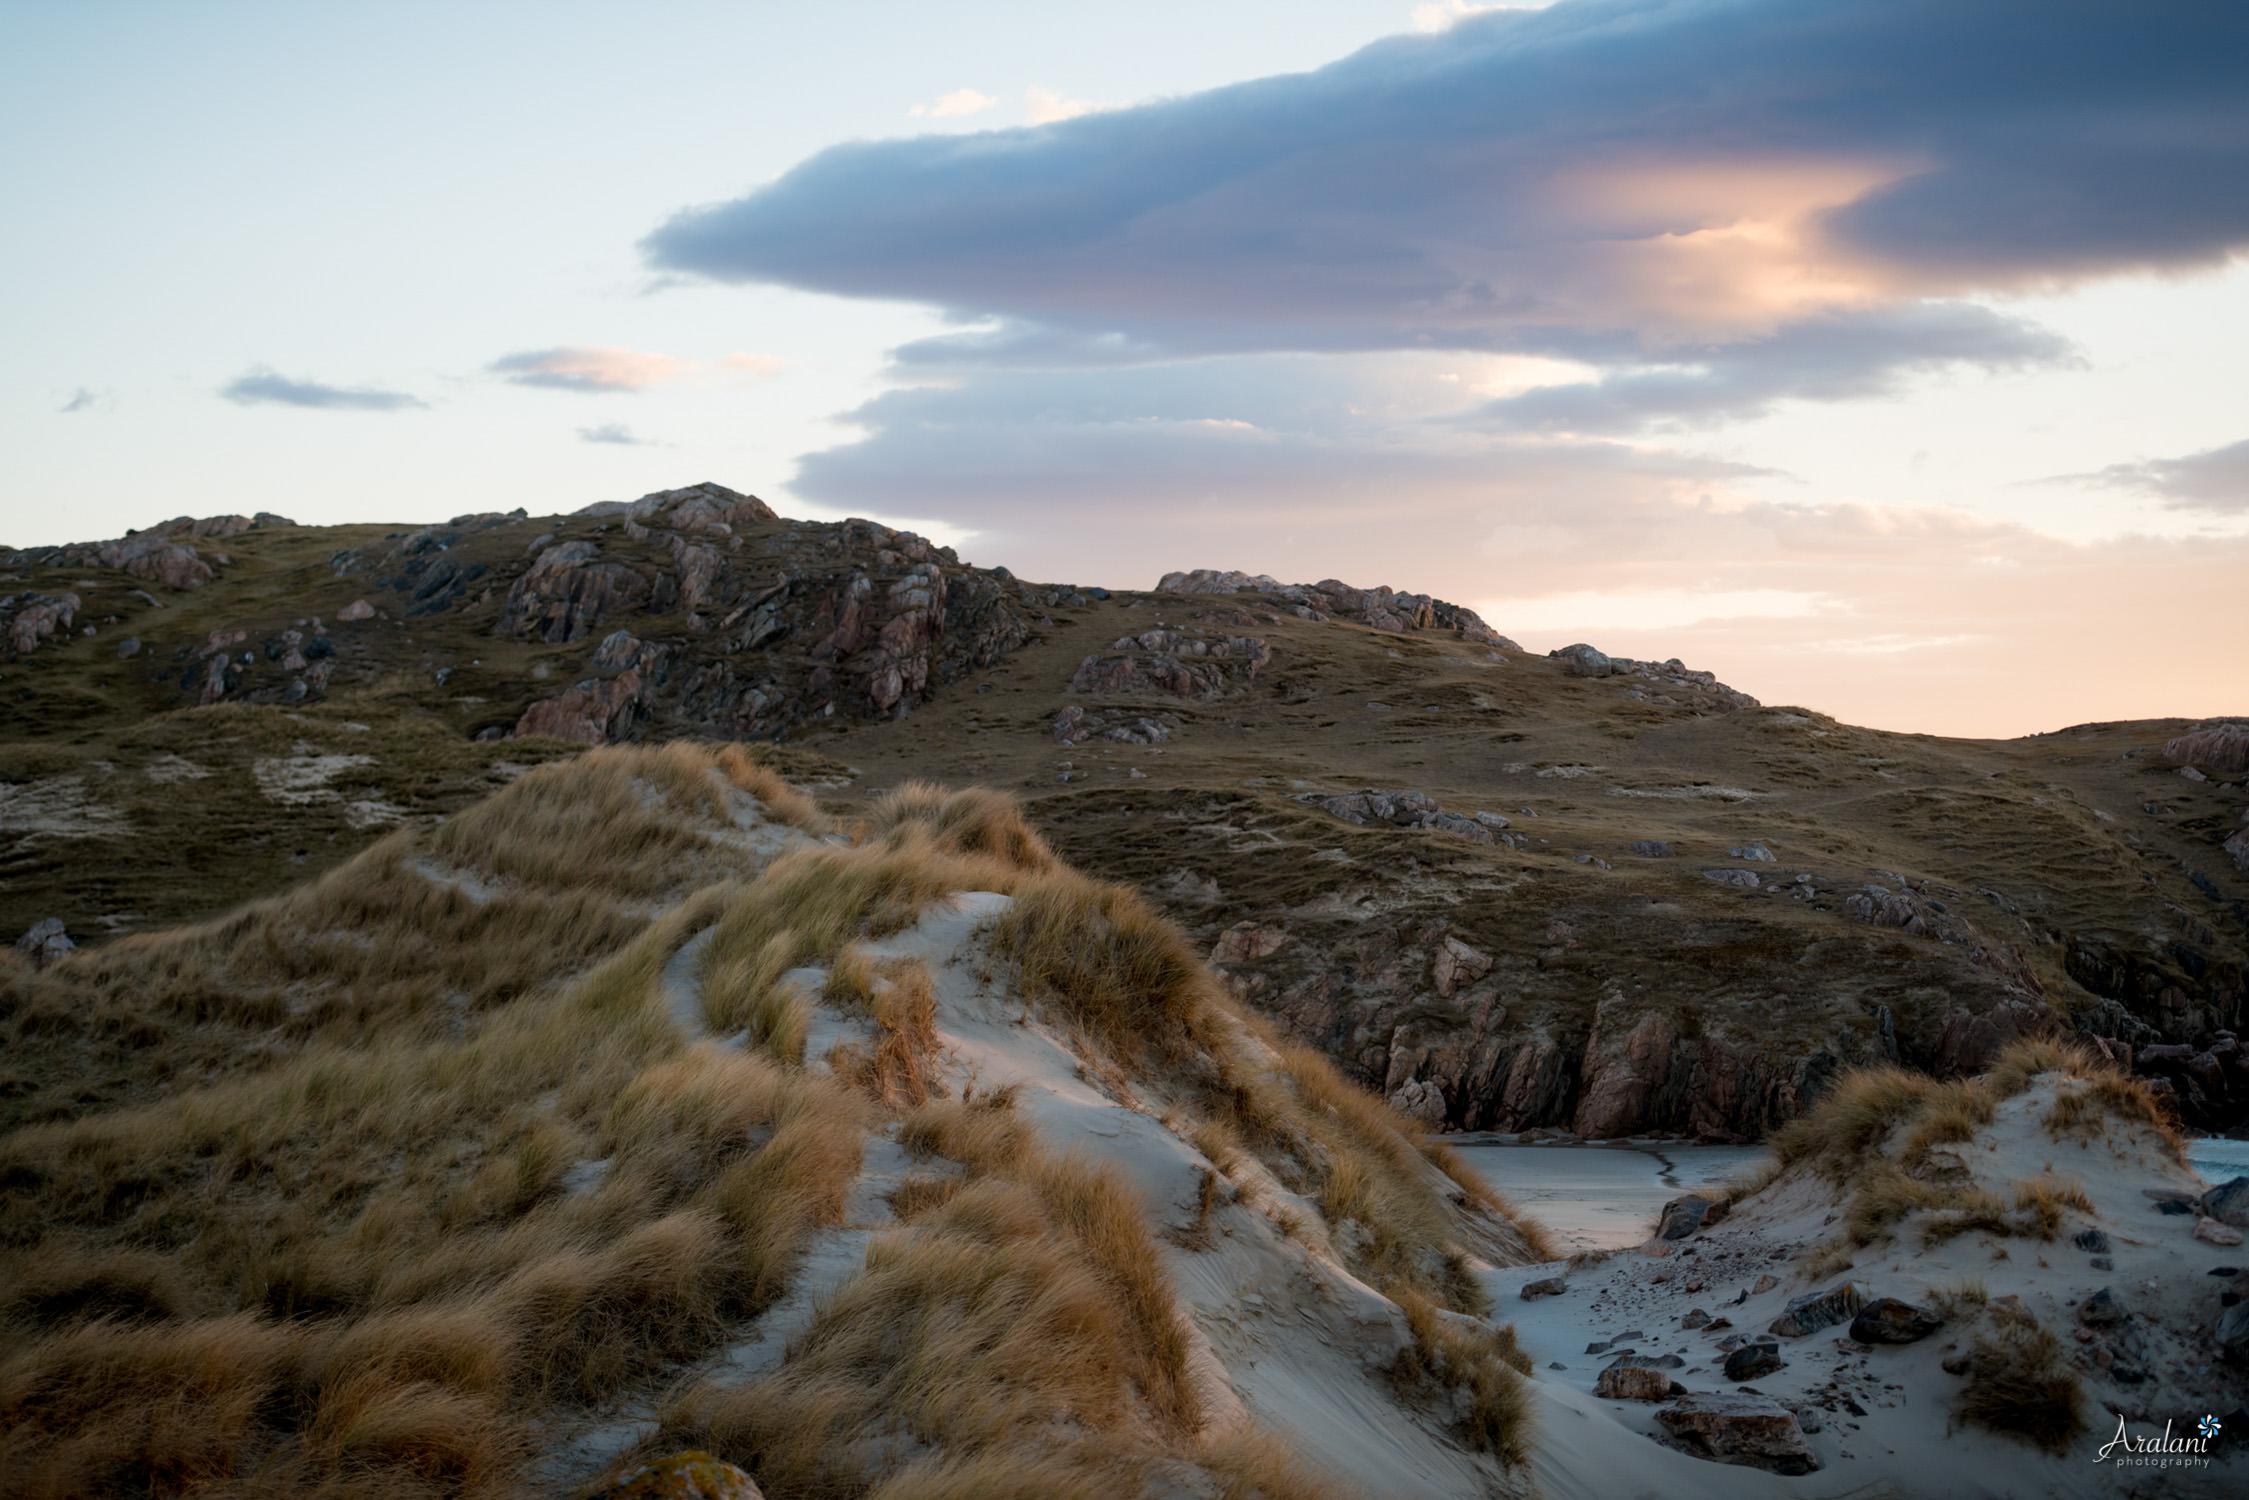 Aralani_Scotland_0044.jpg